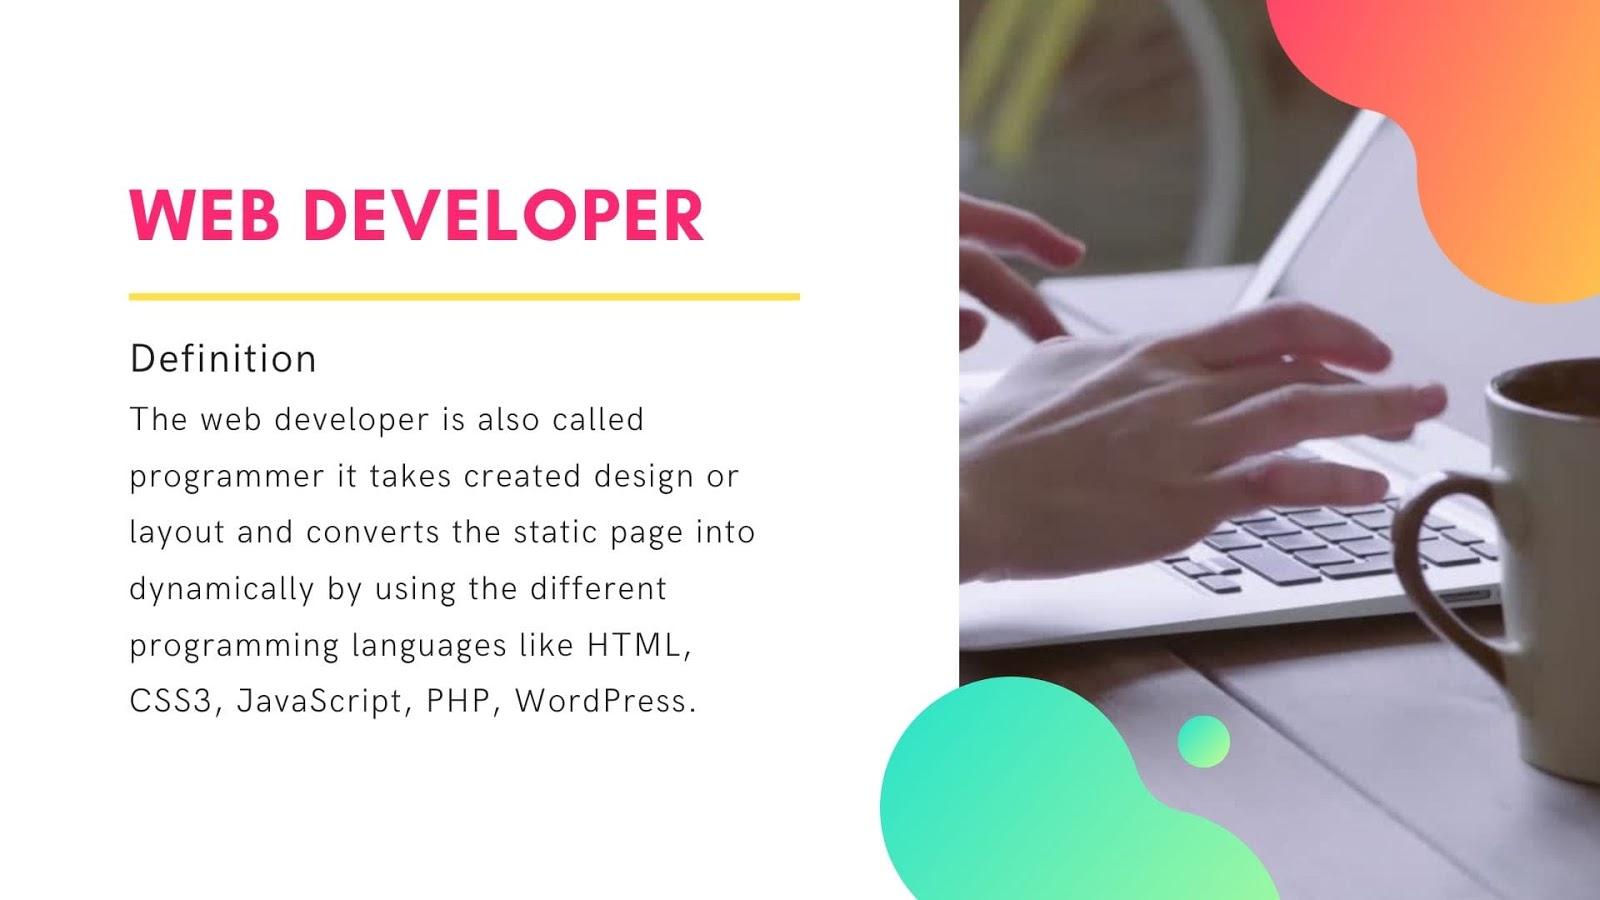 What is Web Developer